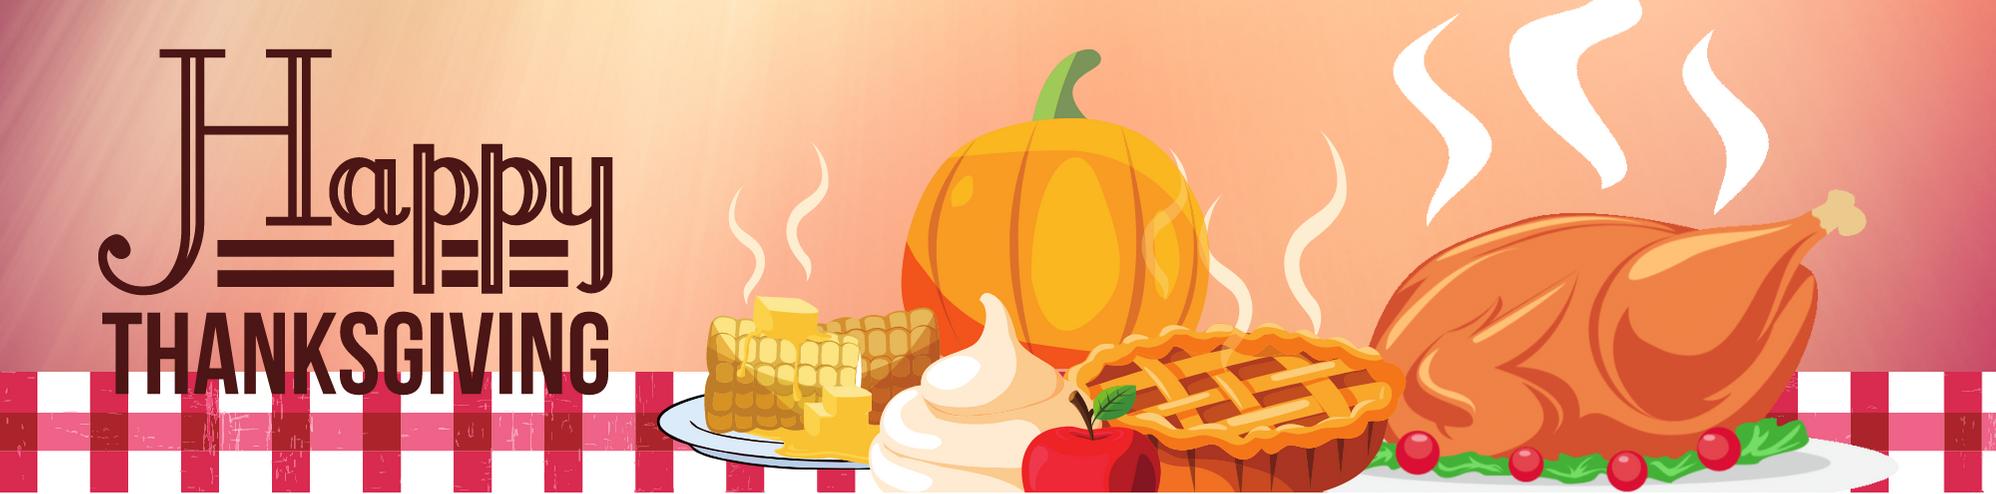 Happy Thanksgiving ANIMATED Virtual BANNER | GOOGLE CLASSROOM